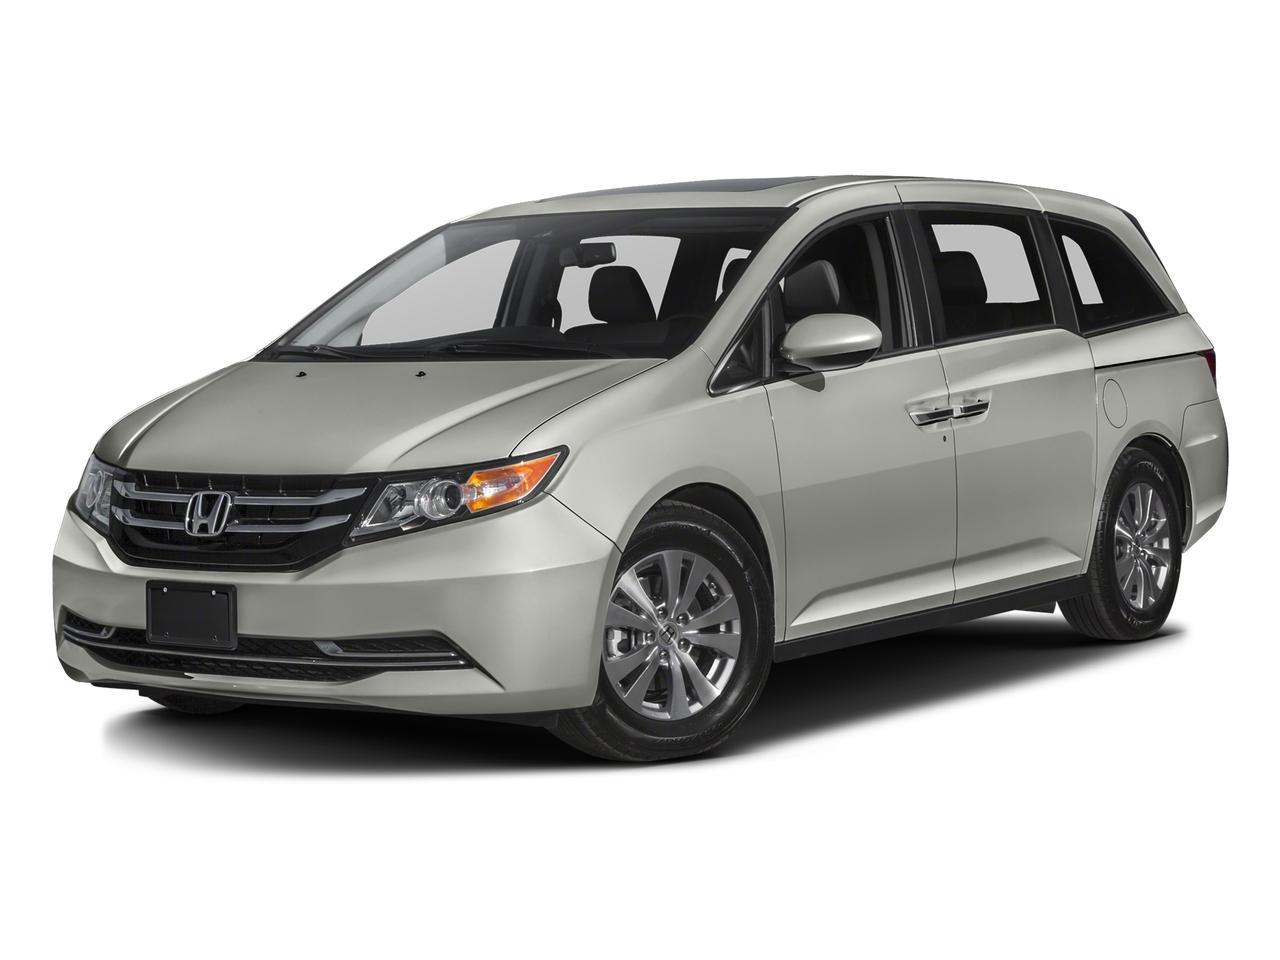 2016 Honda Odyssey Vehicle Photo in Owensboro, KY 42302